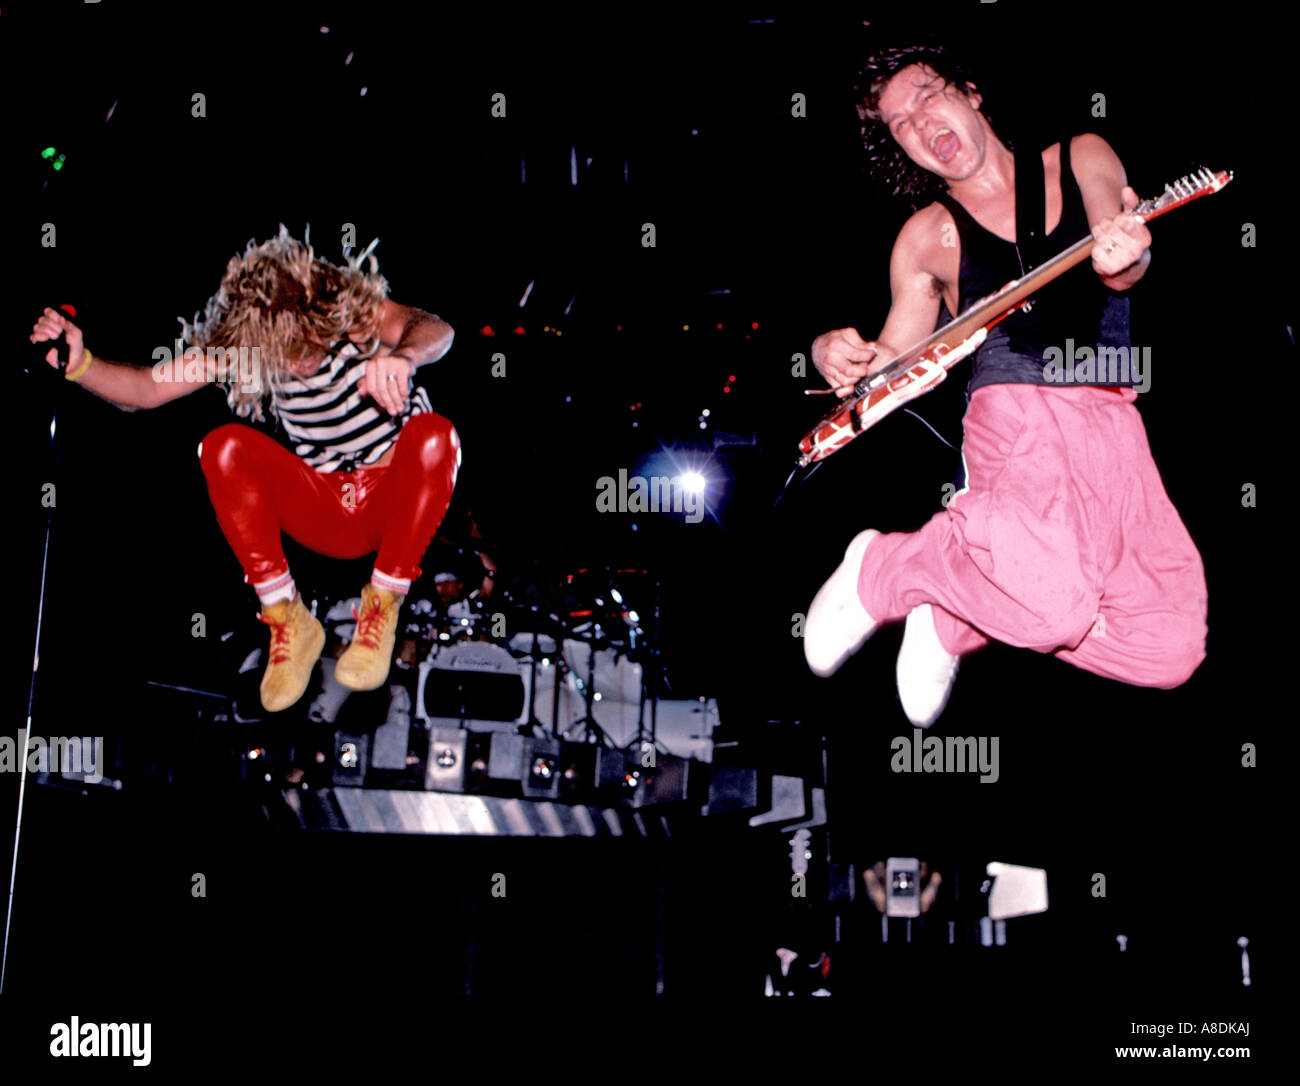 VAN HALEN - US-Rock-Gruppe im Jahr 1988 Stockbild